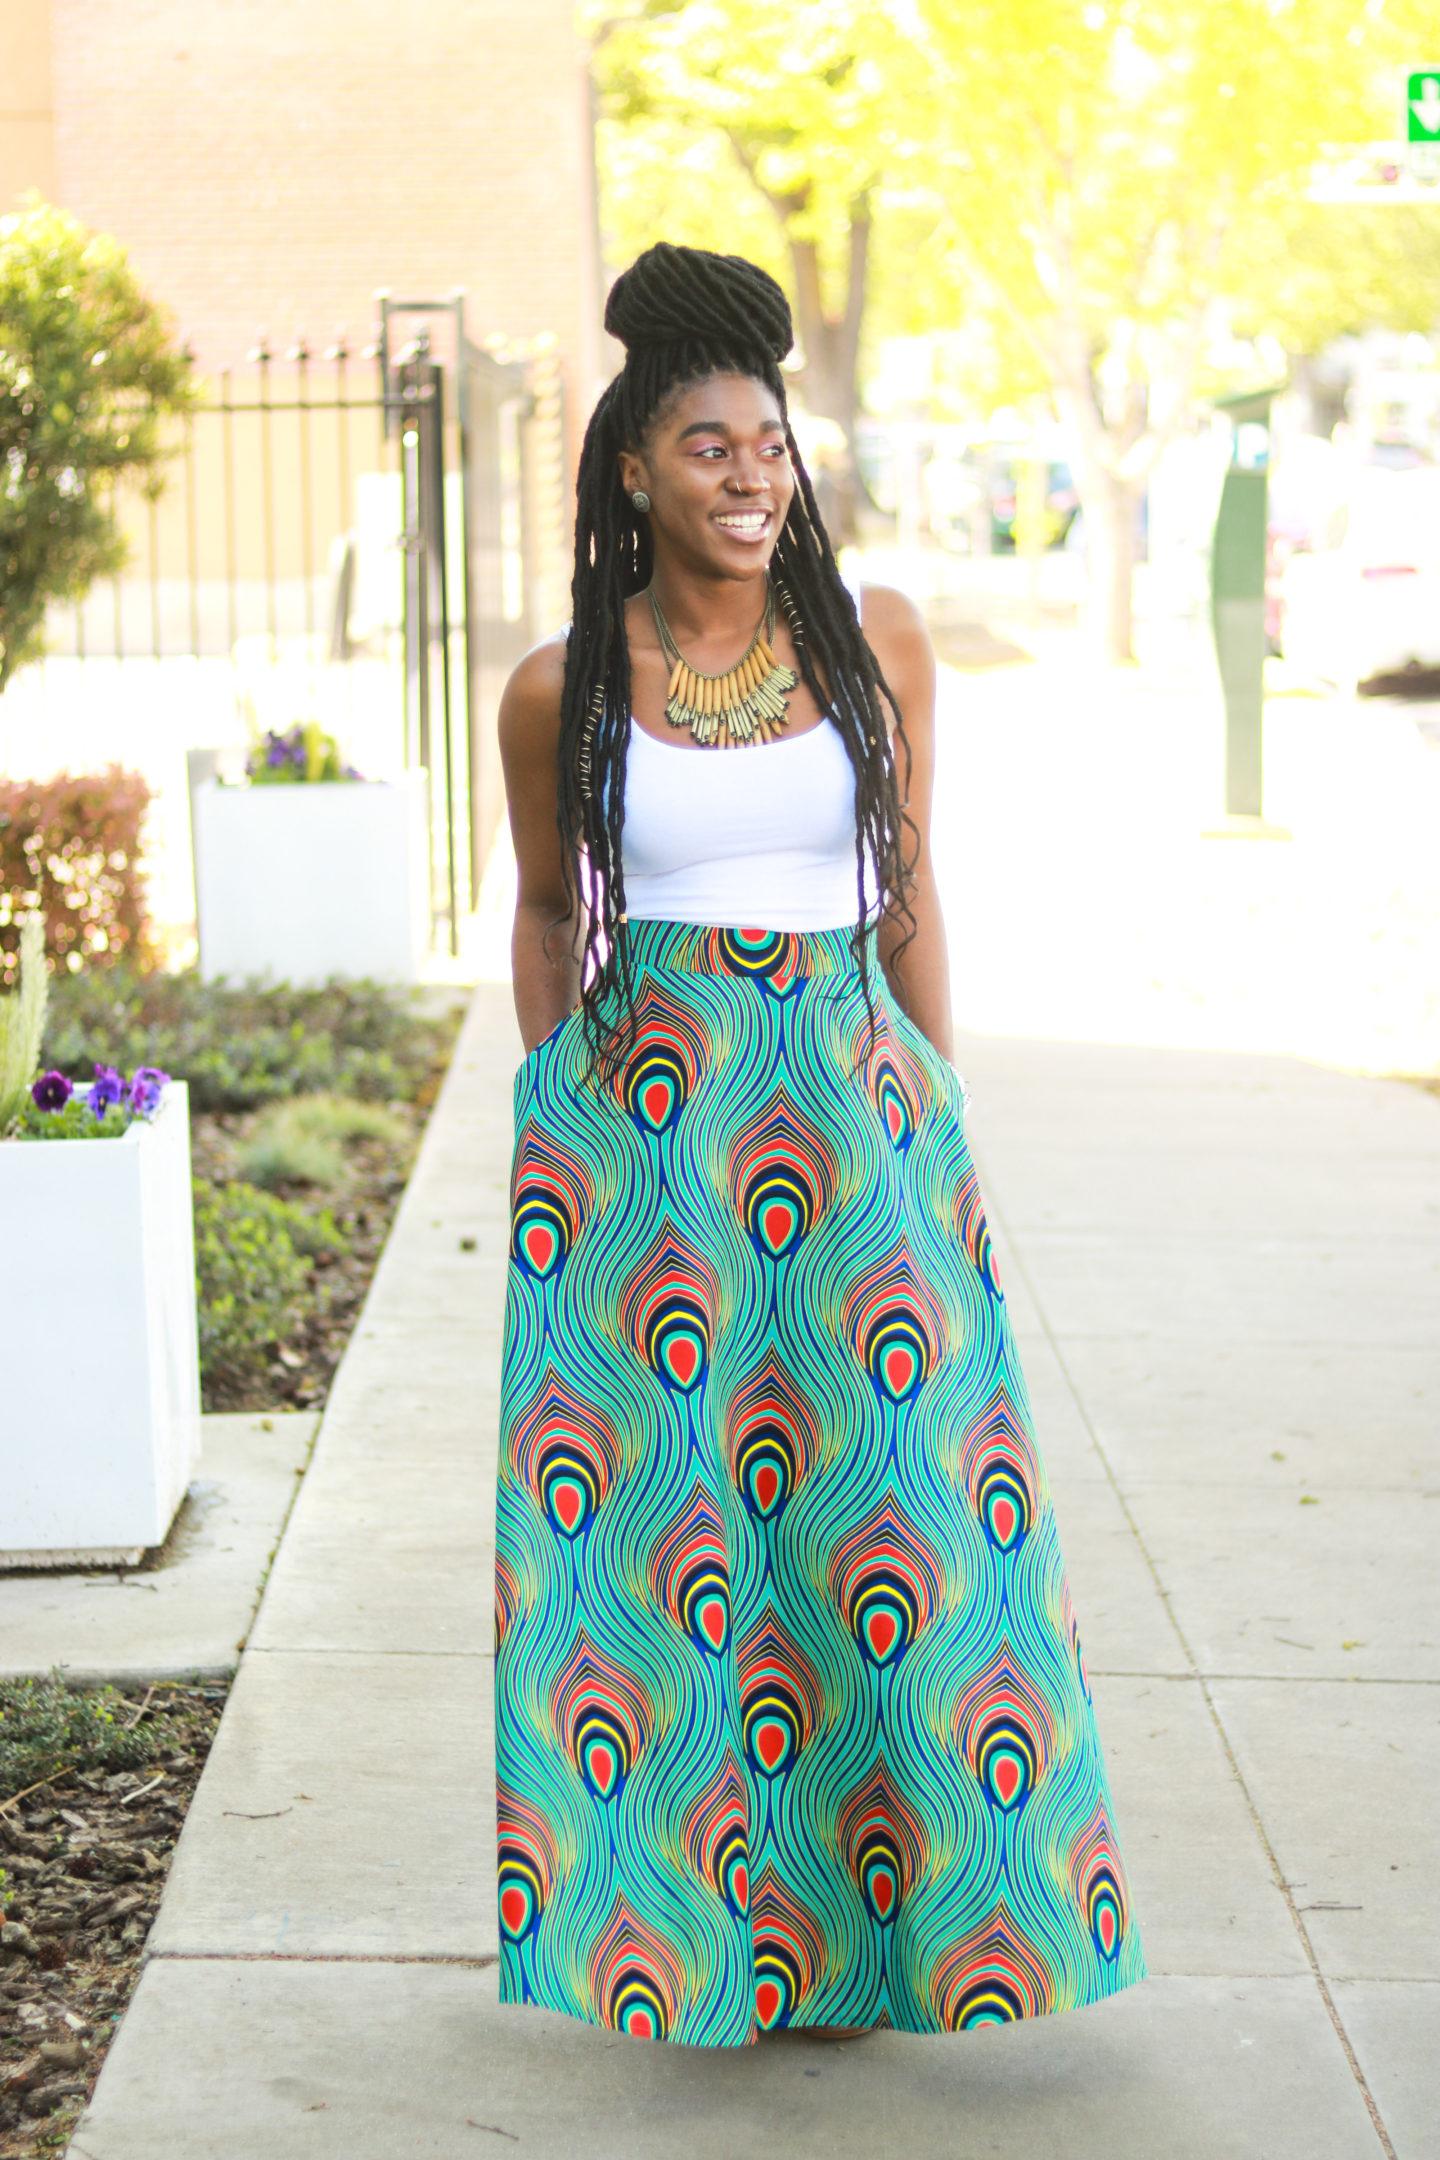 Diy Half Circle Skirt With Pockets Tutorial Montoya Mayo